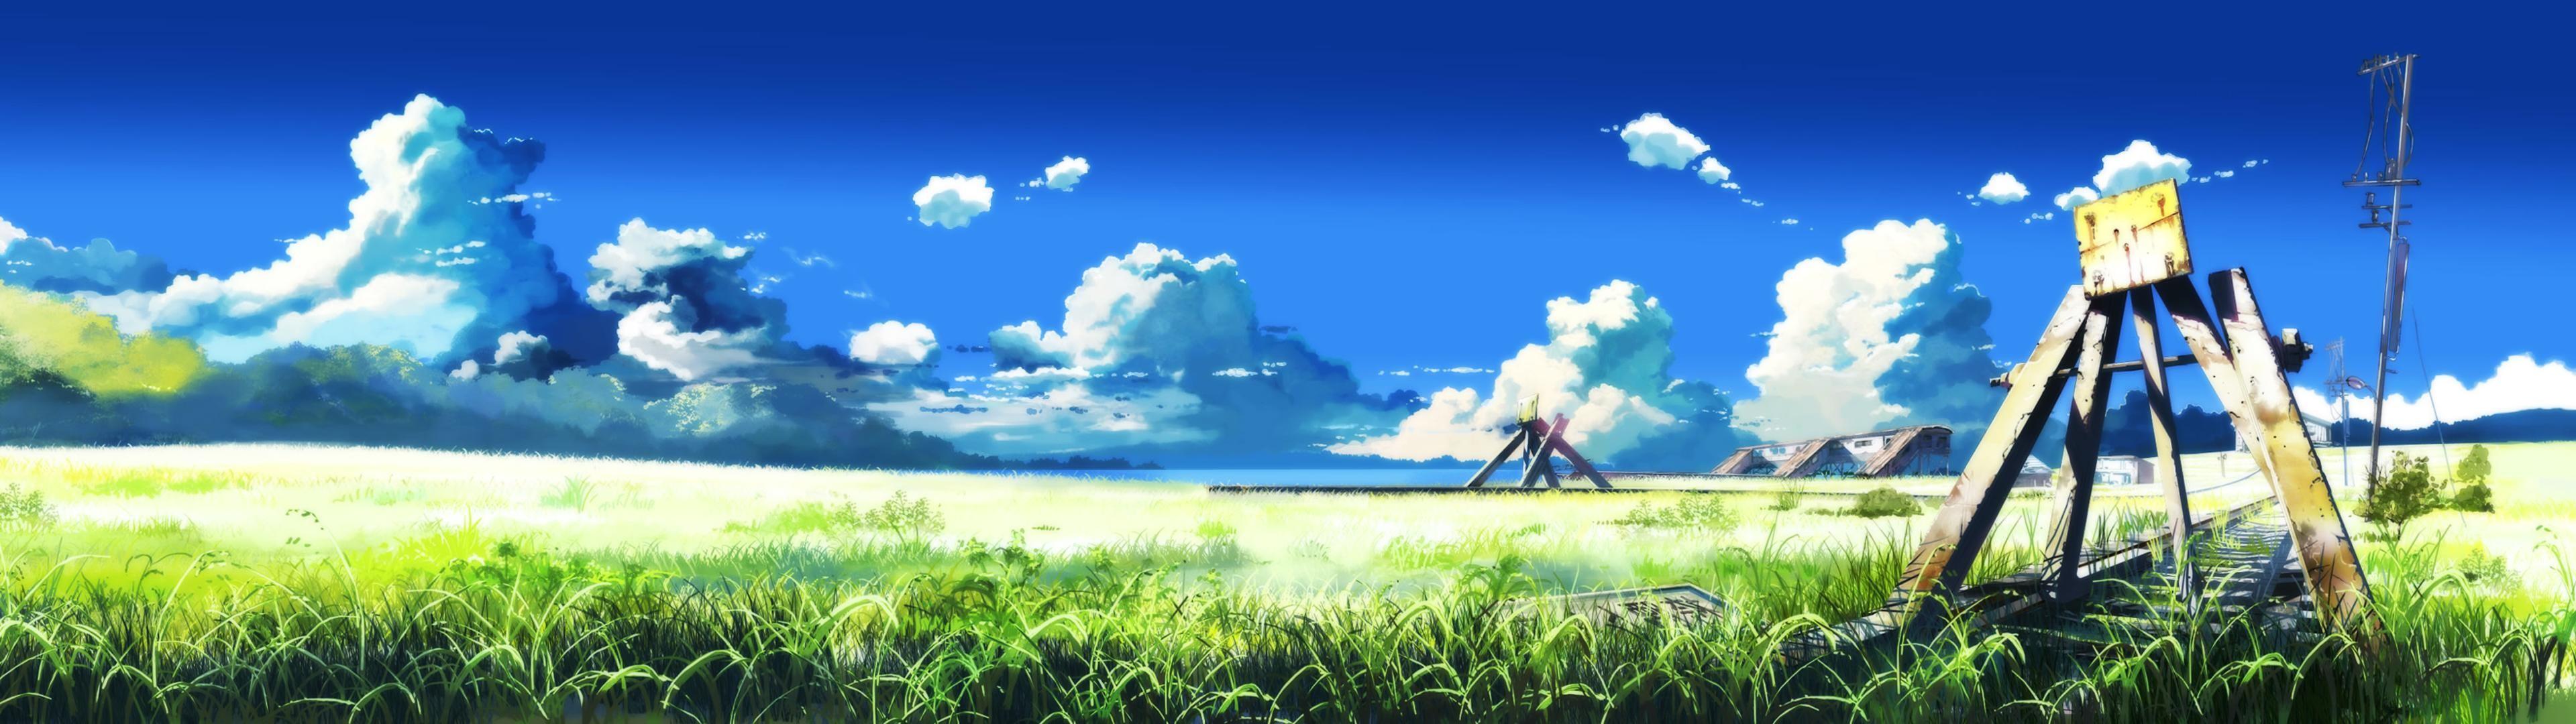 Anime Landscape Dual Screen Res: / Size:441kb. Views: 74029